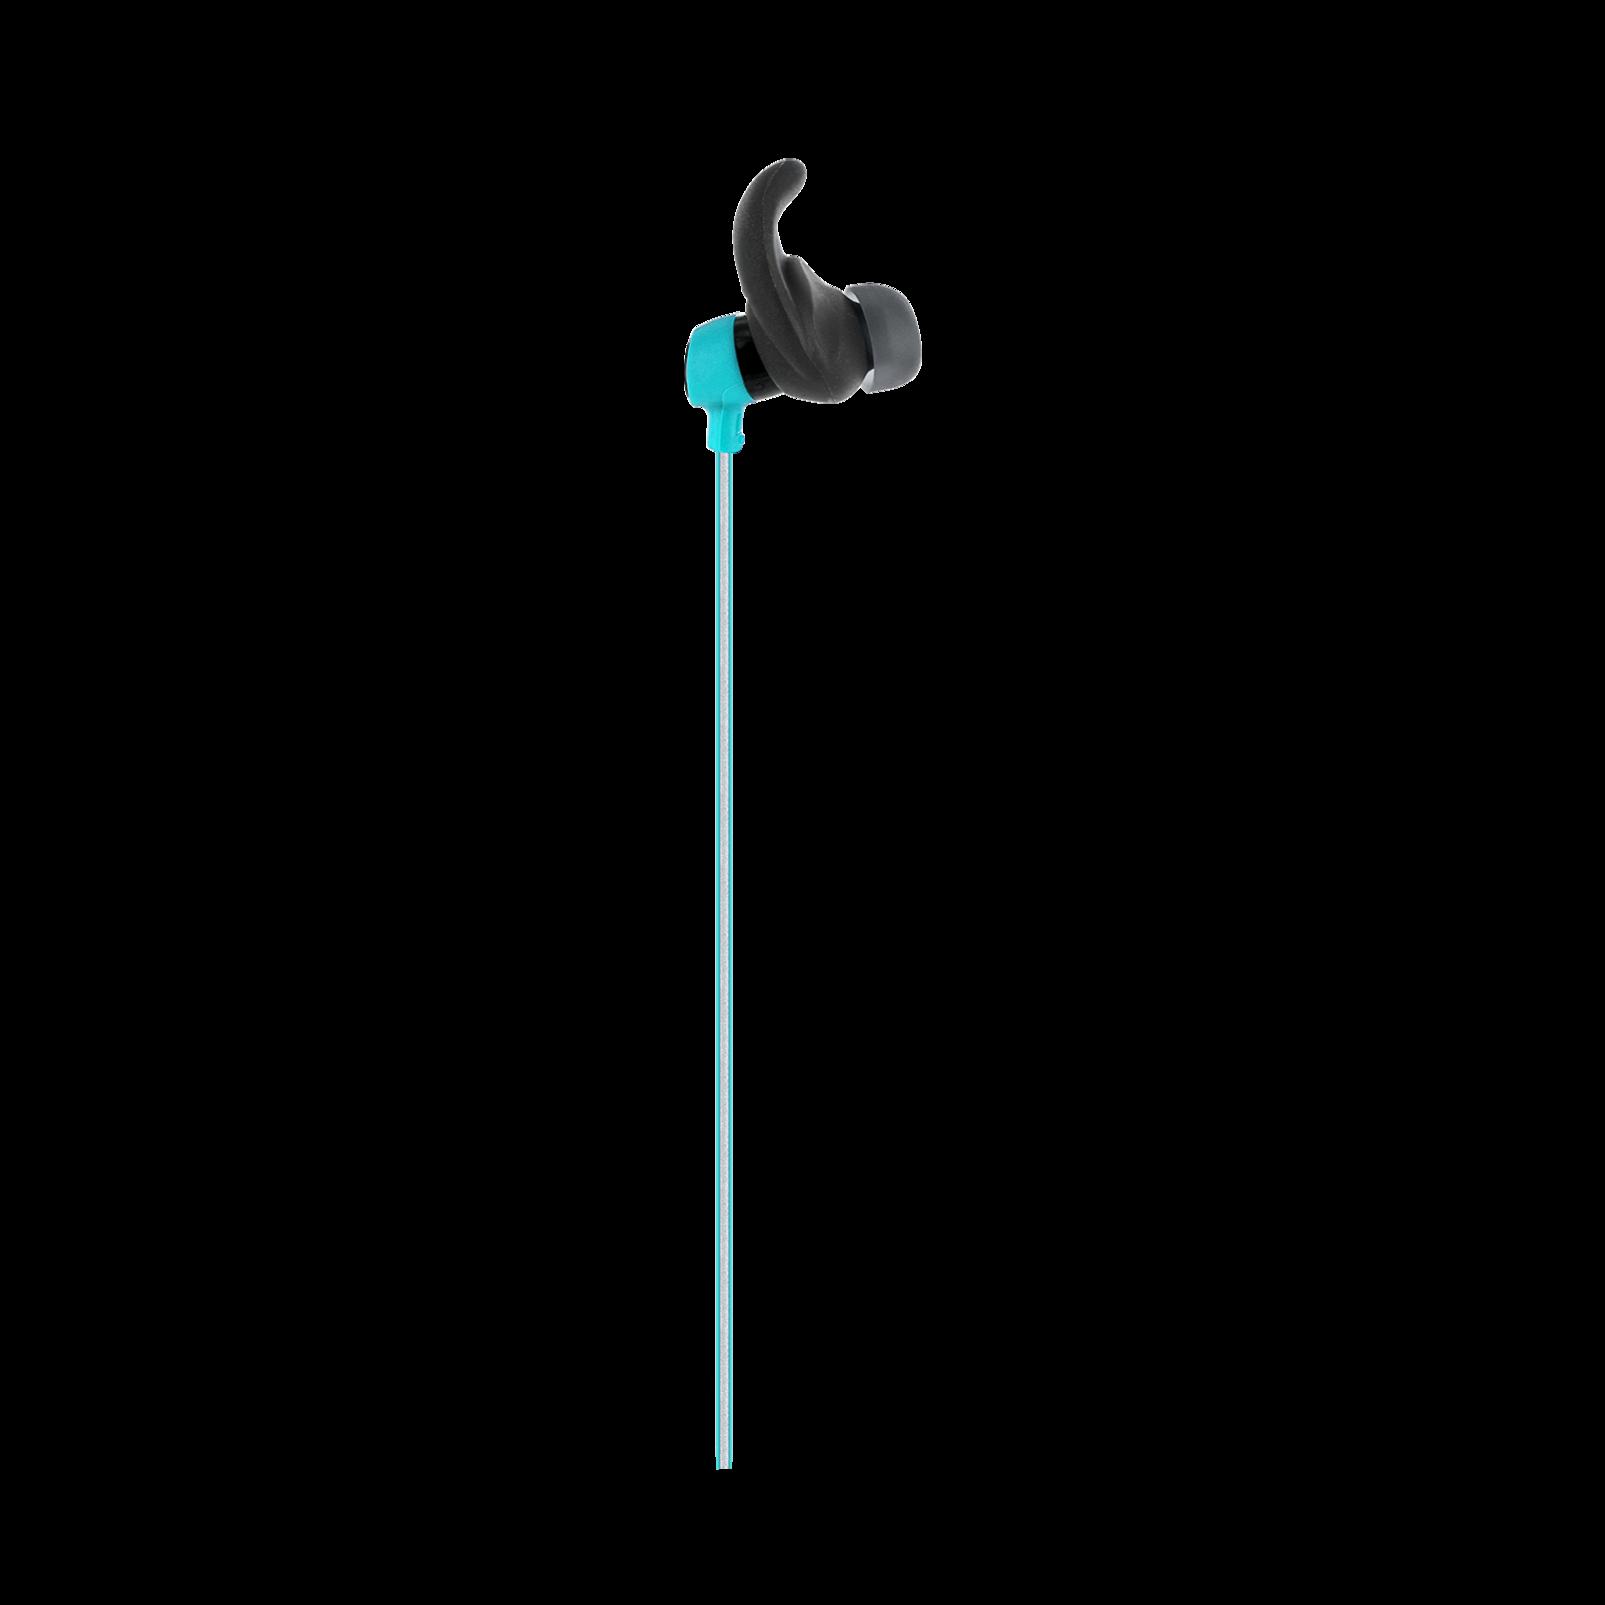 Reflect Mini - Teal - Lightweight, in-ear sport headphones - Detailshot 8